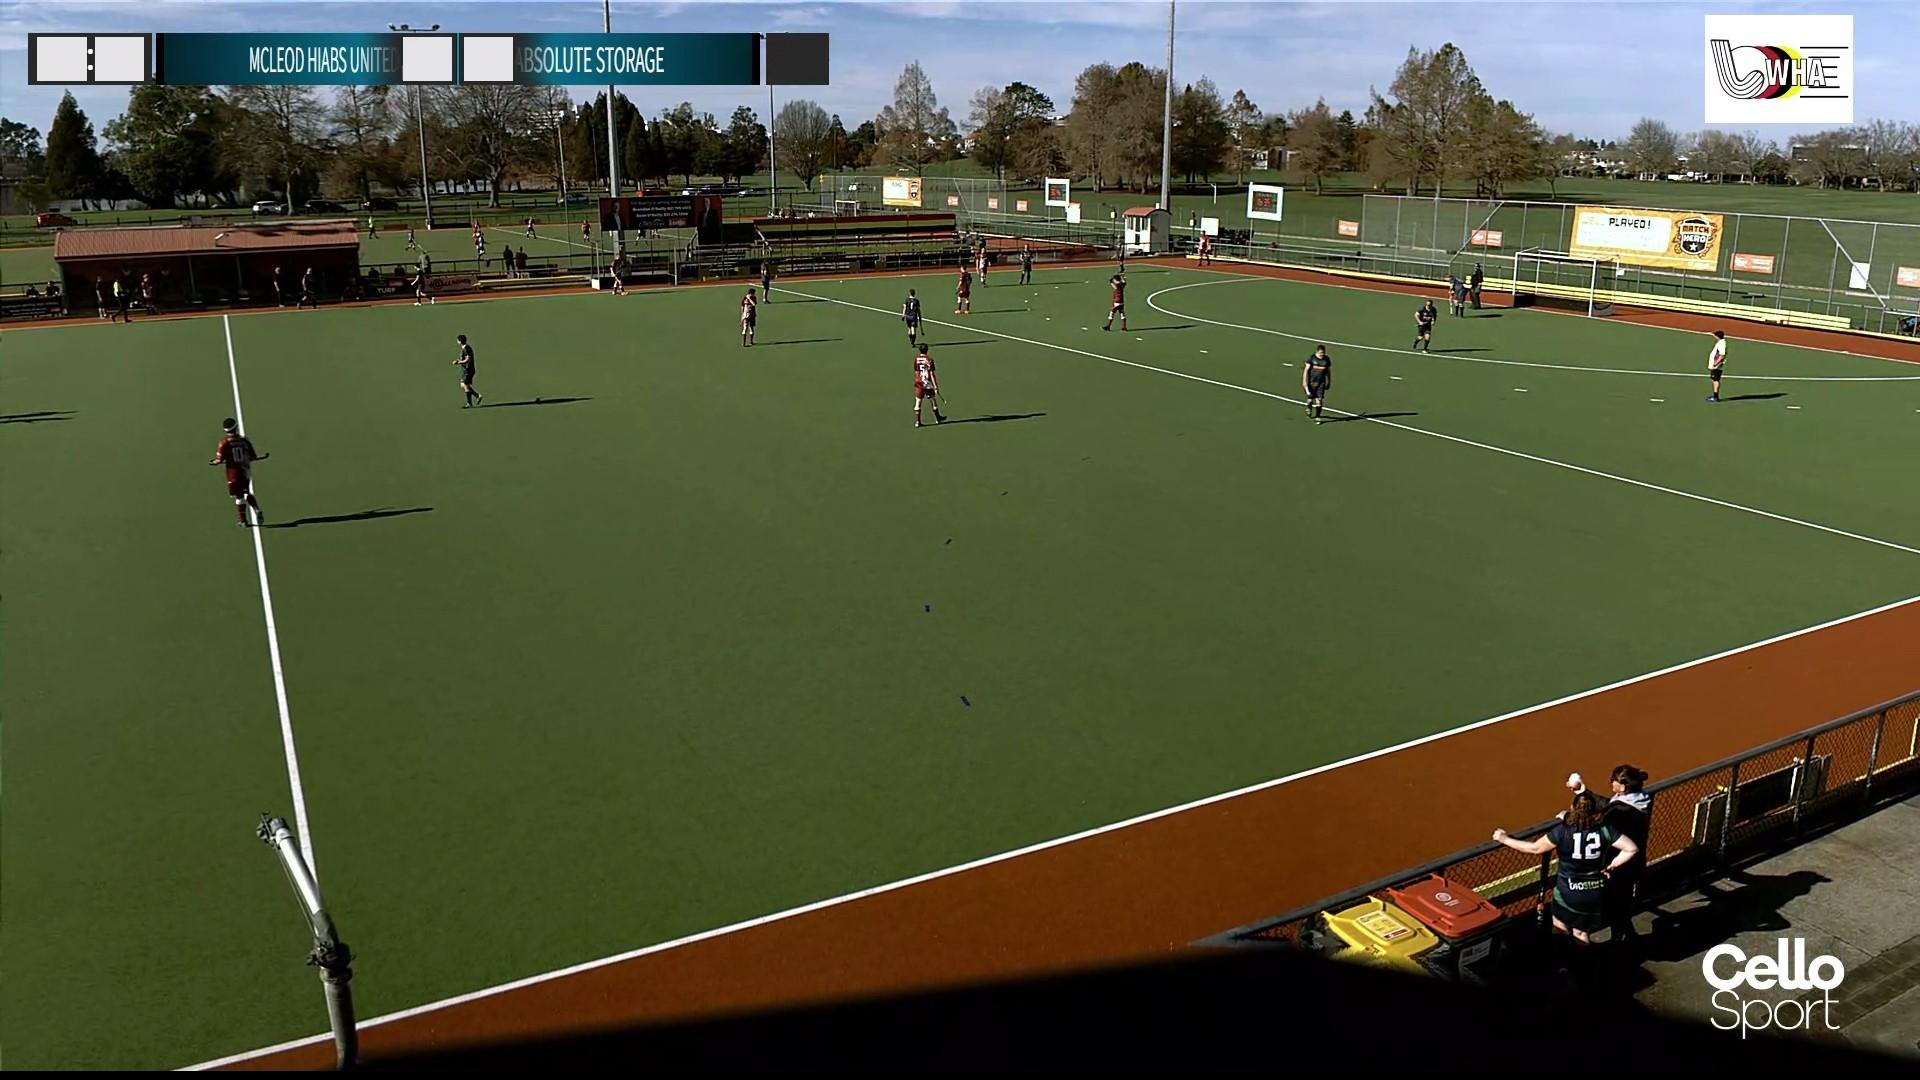 Live-Streaming is starting at Waikato Hockey